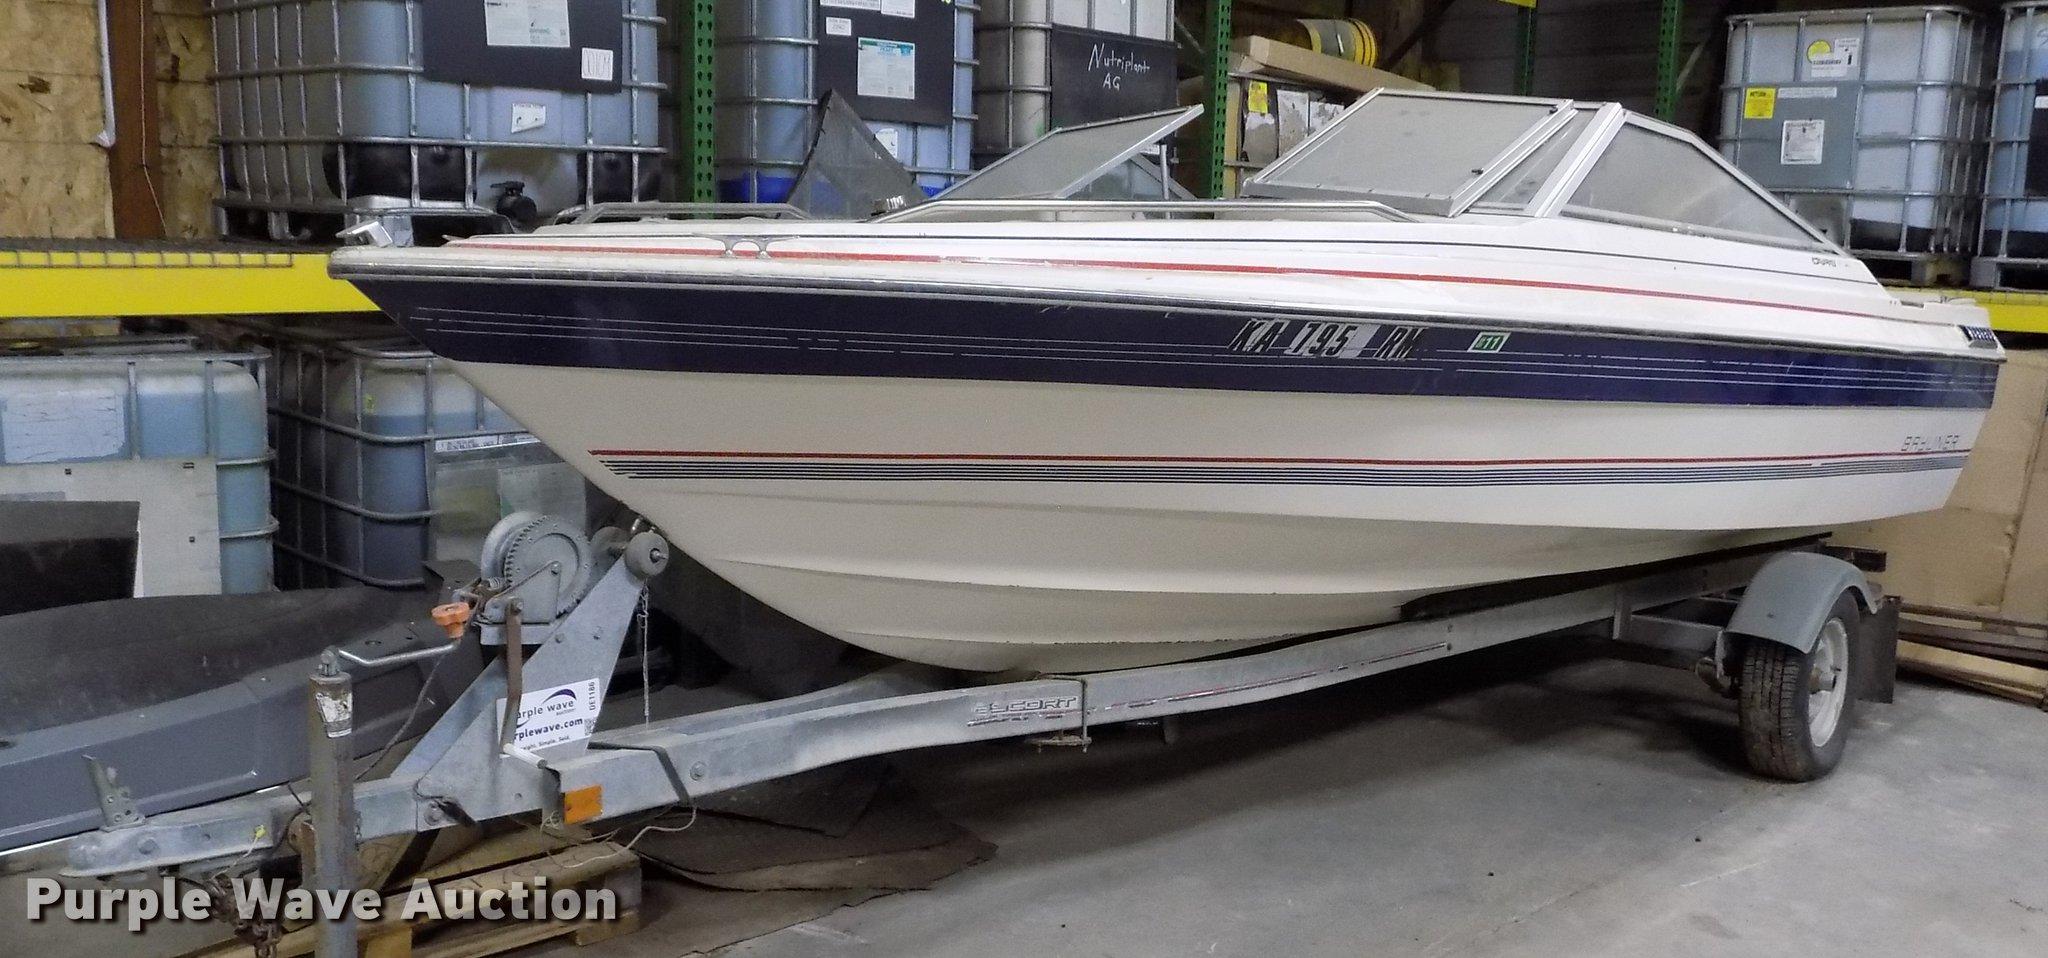 1985 Bayliner Capri boat with trailer in Scandia, KS | Item DE1186 for sale  | Purple Wave | Bayliner Capri Volvo Penta Fuel Filter Location |  | Purple Wave